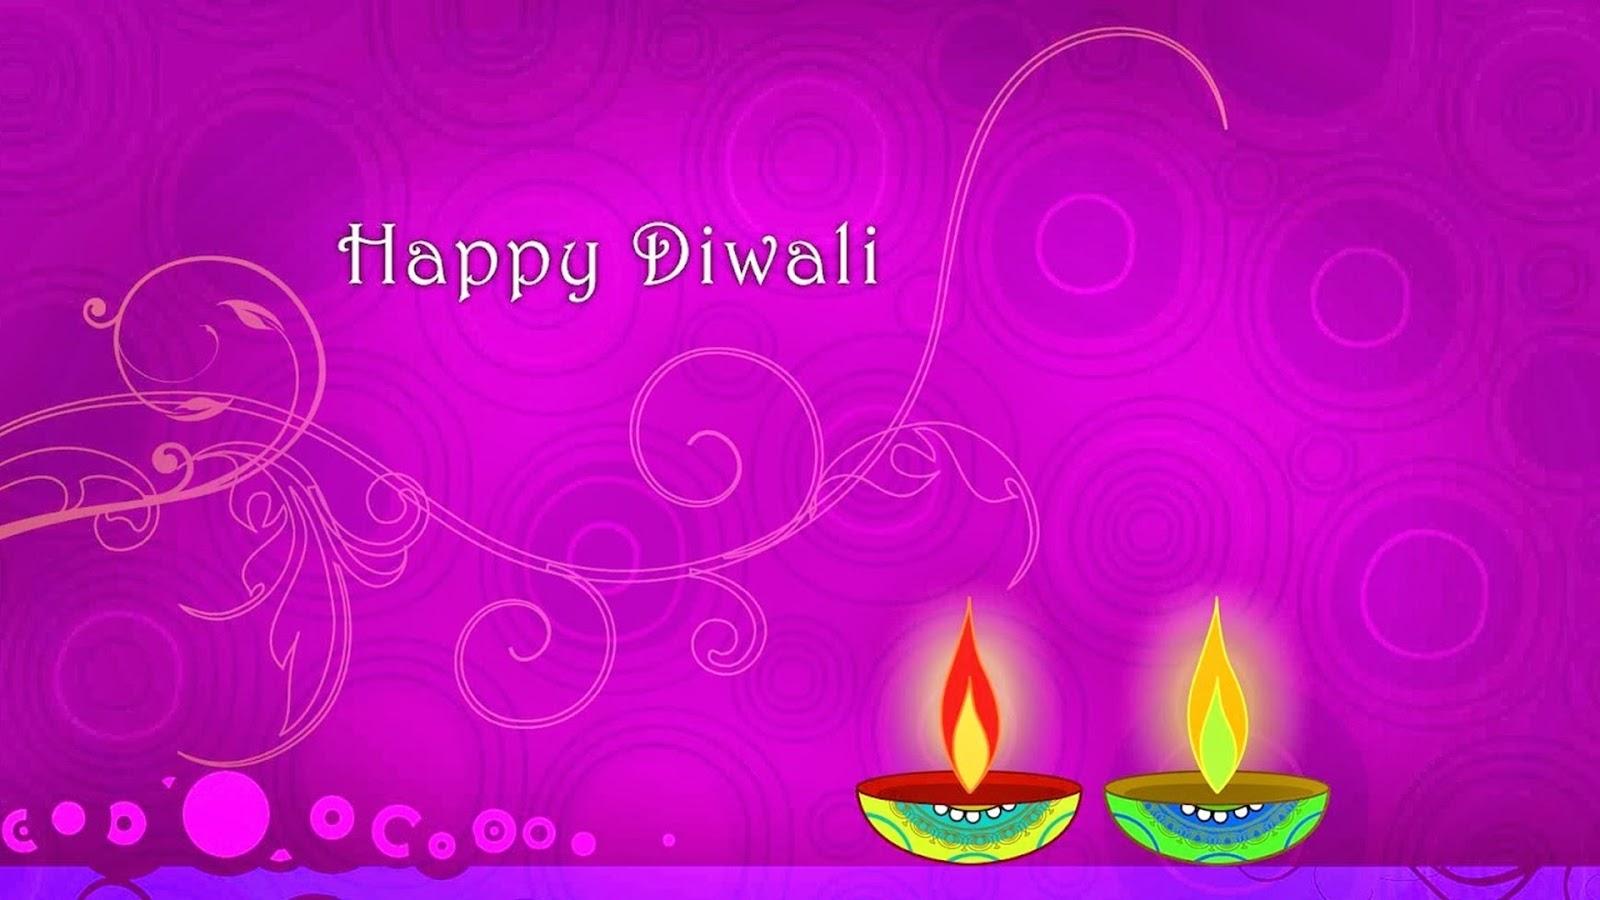 Diwali Wallpapers for Desktop